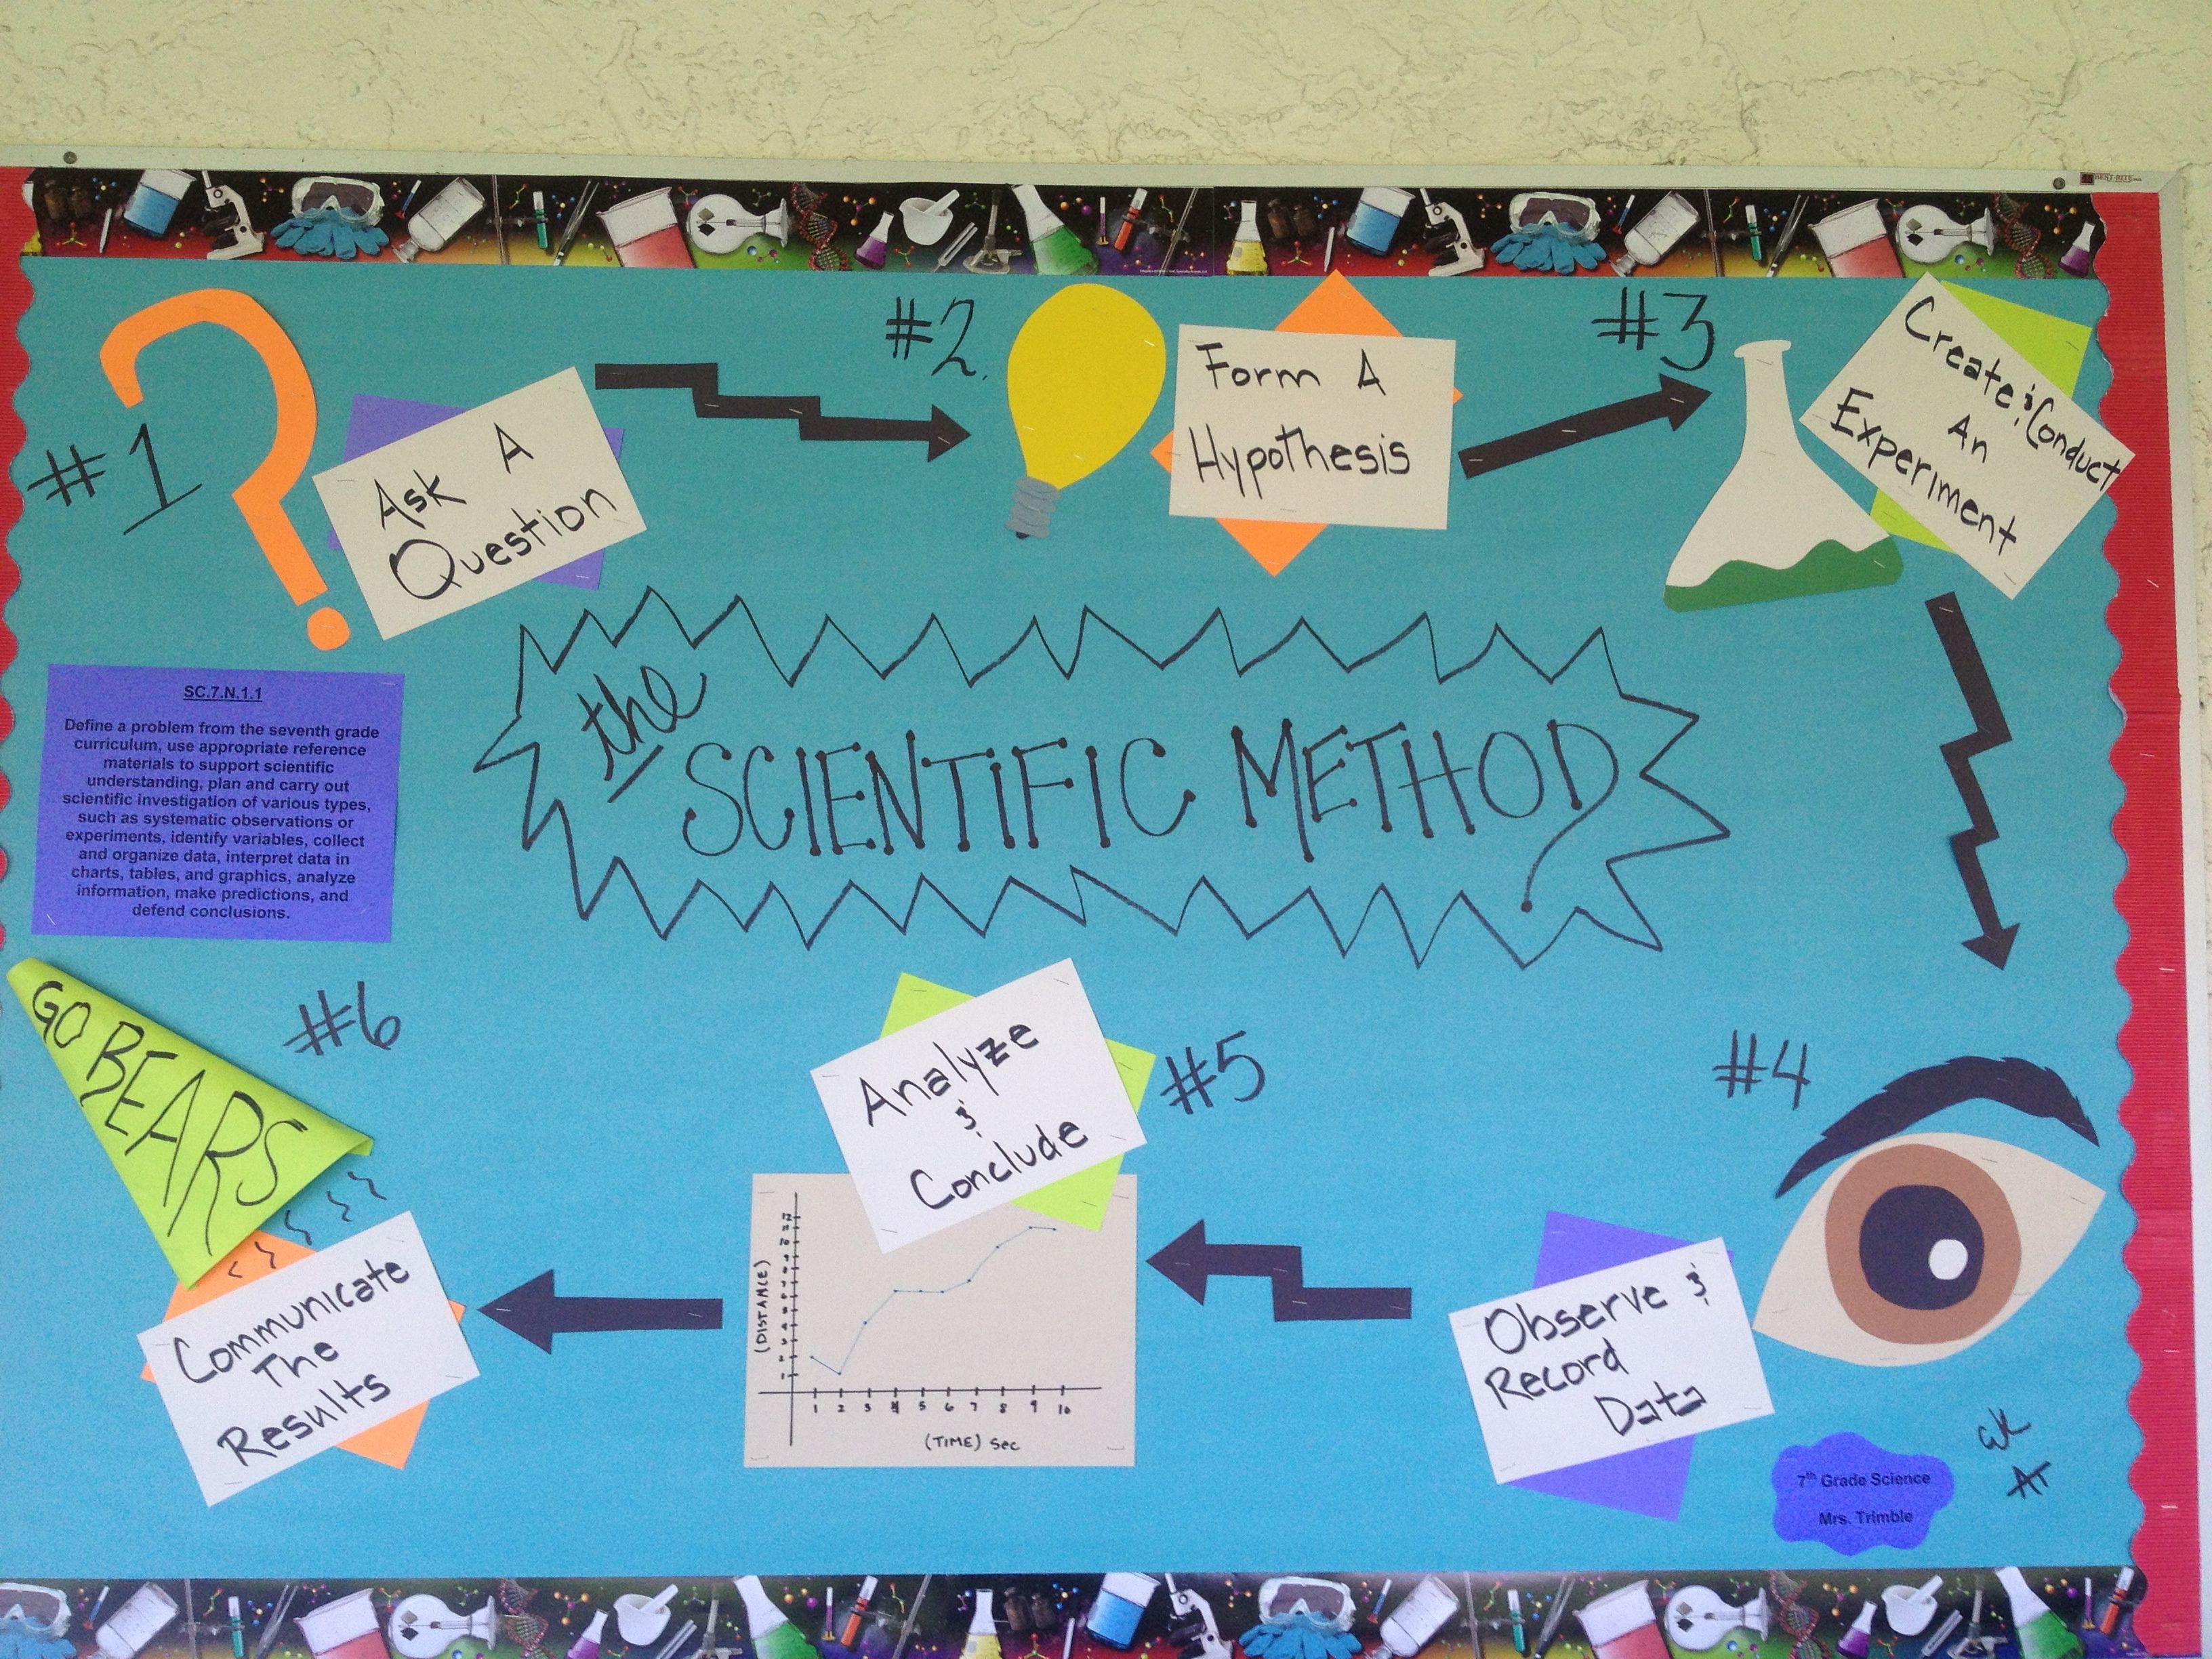 Scientific Method Science Bulletin Board. Much